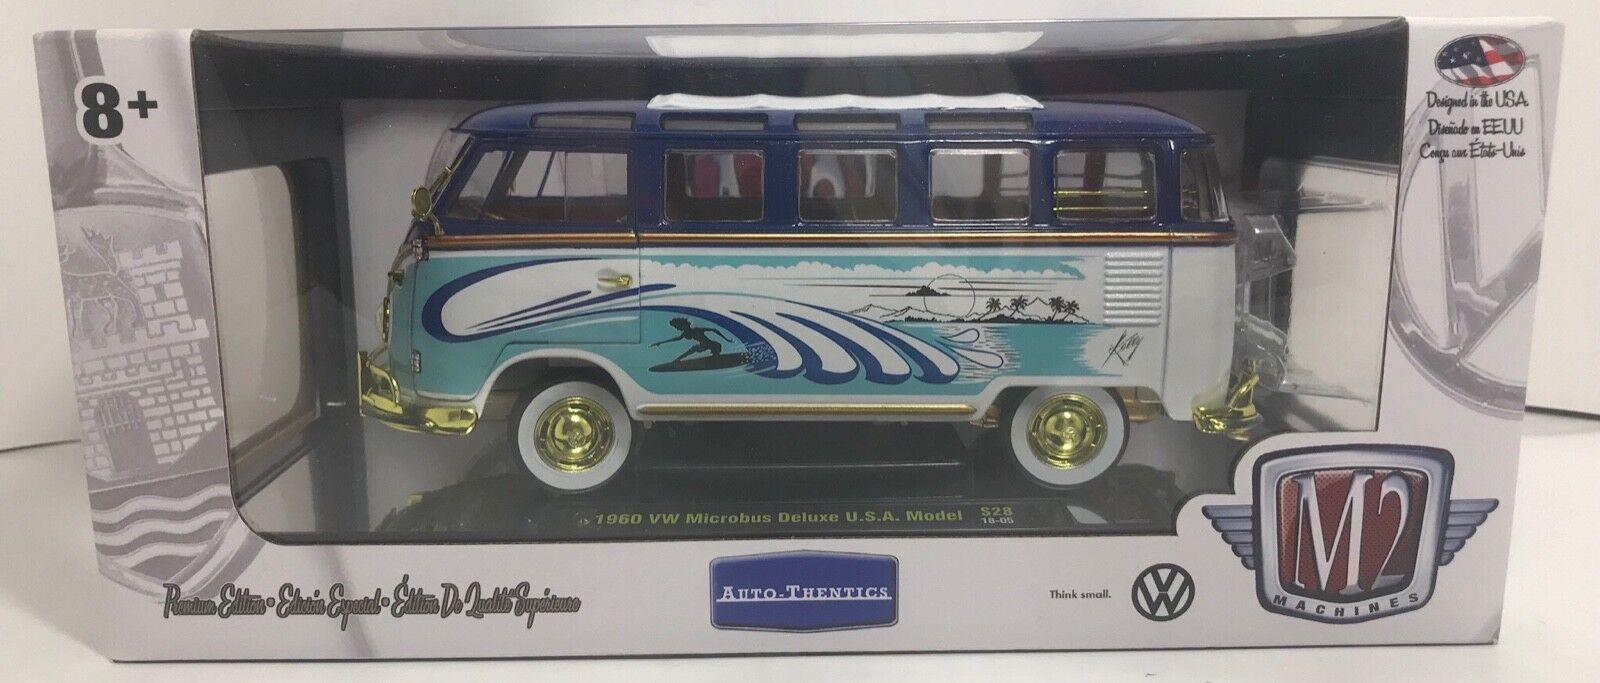 M2 Auto-thentics 1960 1960 1960 VW microbús Deluxe Usa Modelo Chase 500 Piezas Escala 1 24 6a6ea4